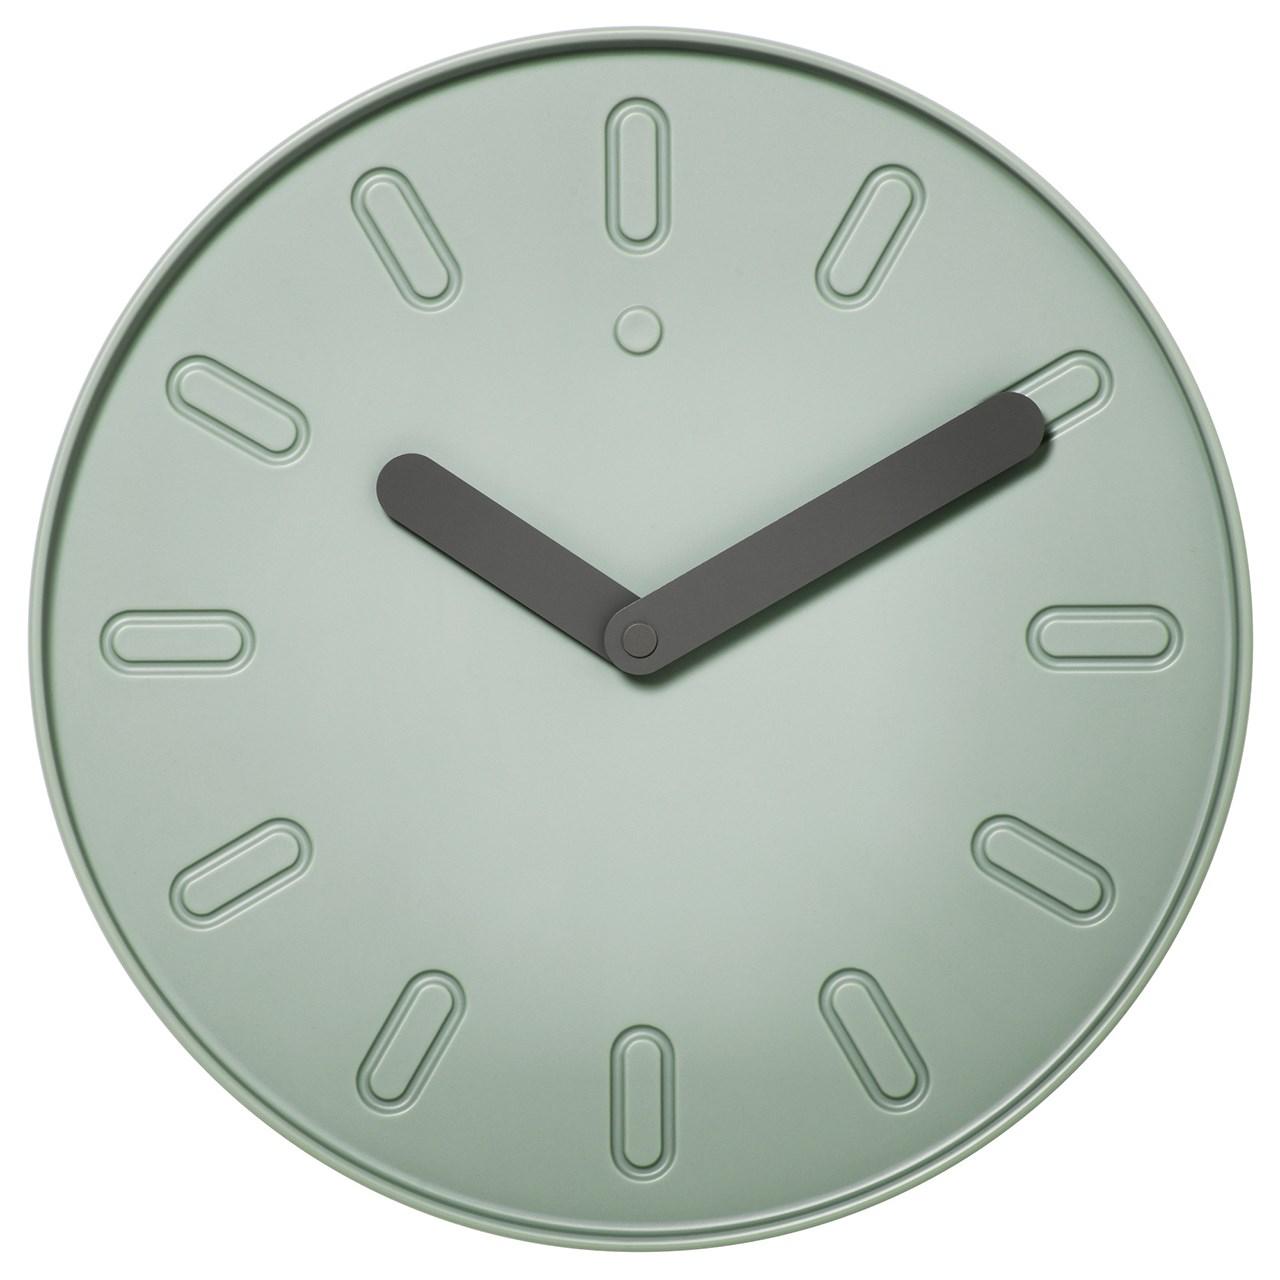 ساعت دیواری ایکیا مدل Slipsten